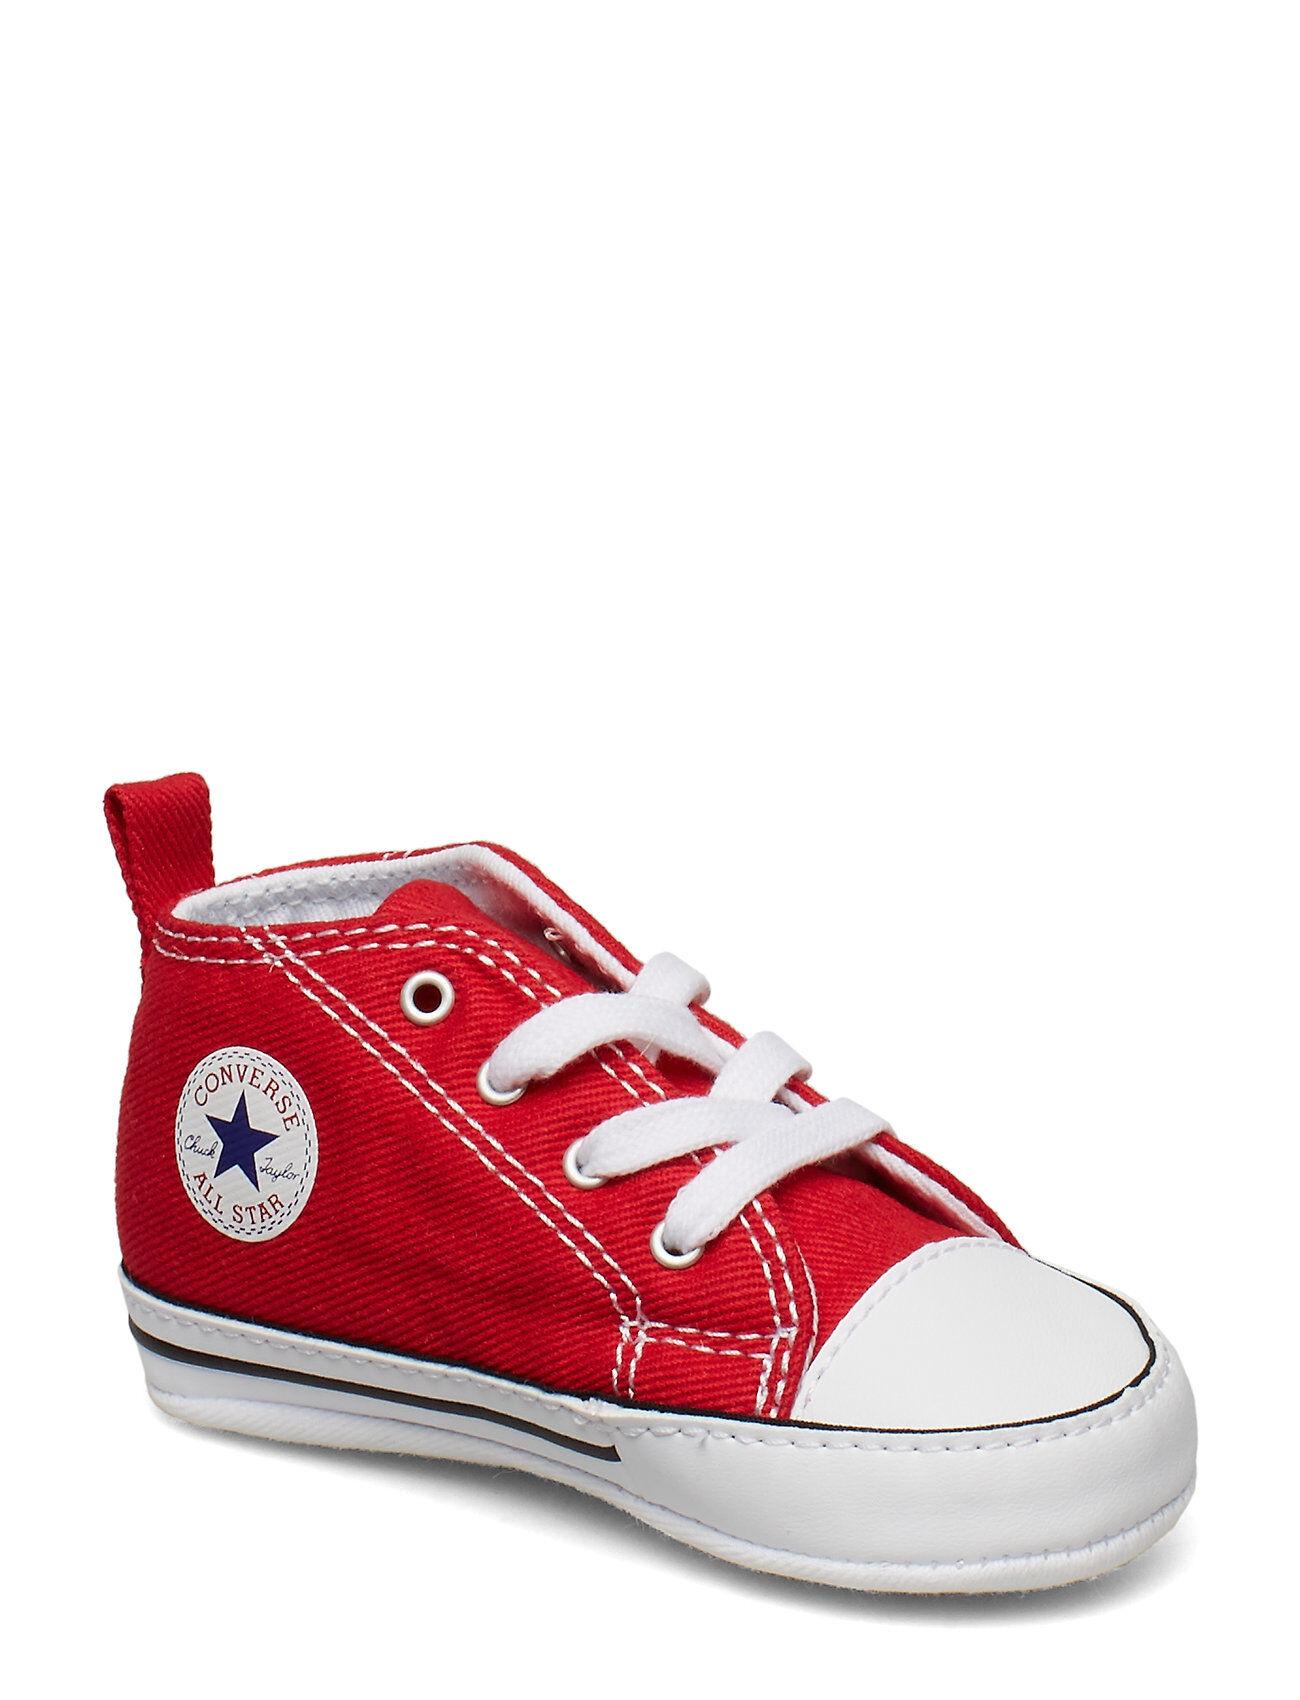 Image of CONVERSE First Star Hi Tennarit Sneakerit Kengät Punainen CONVERSE